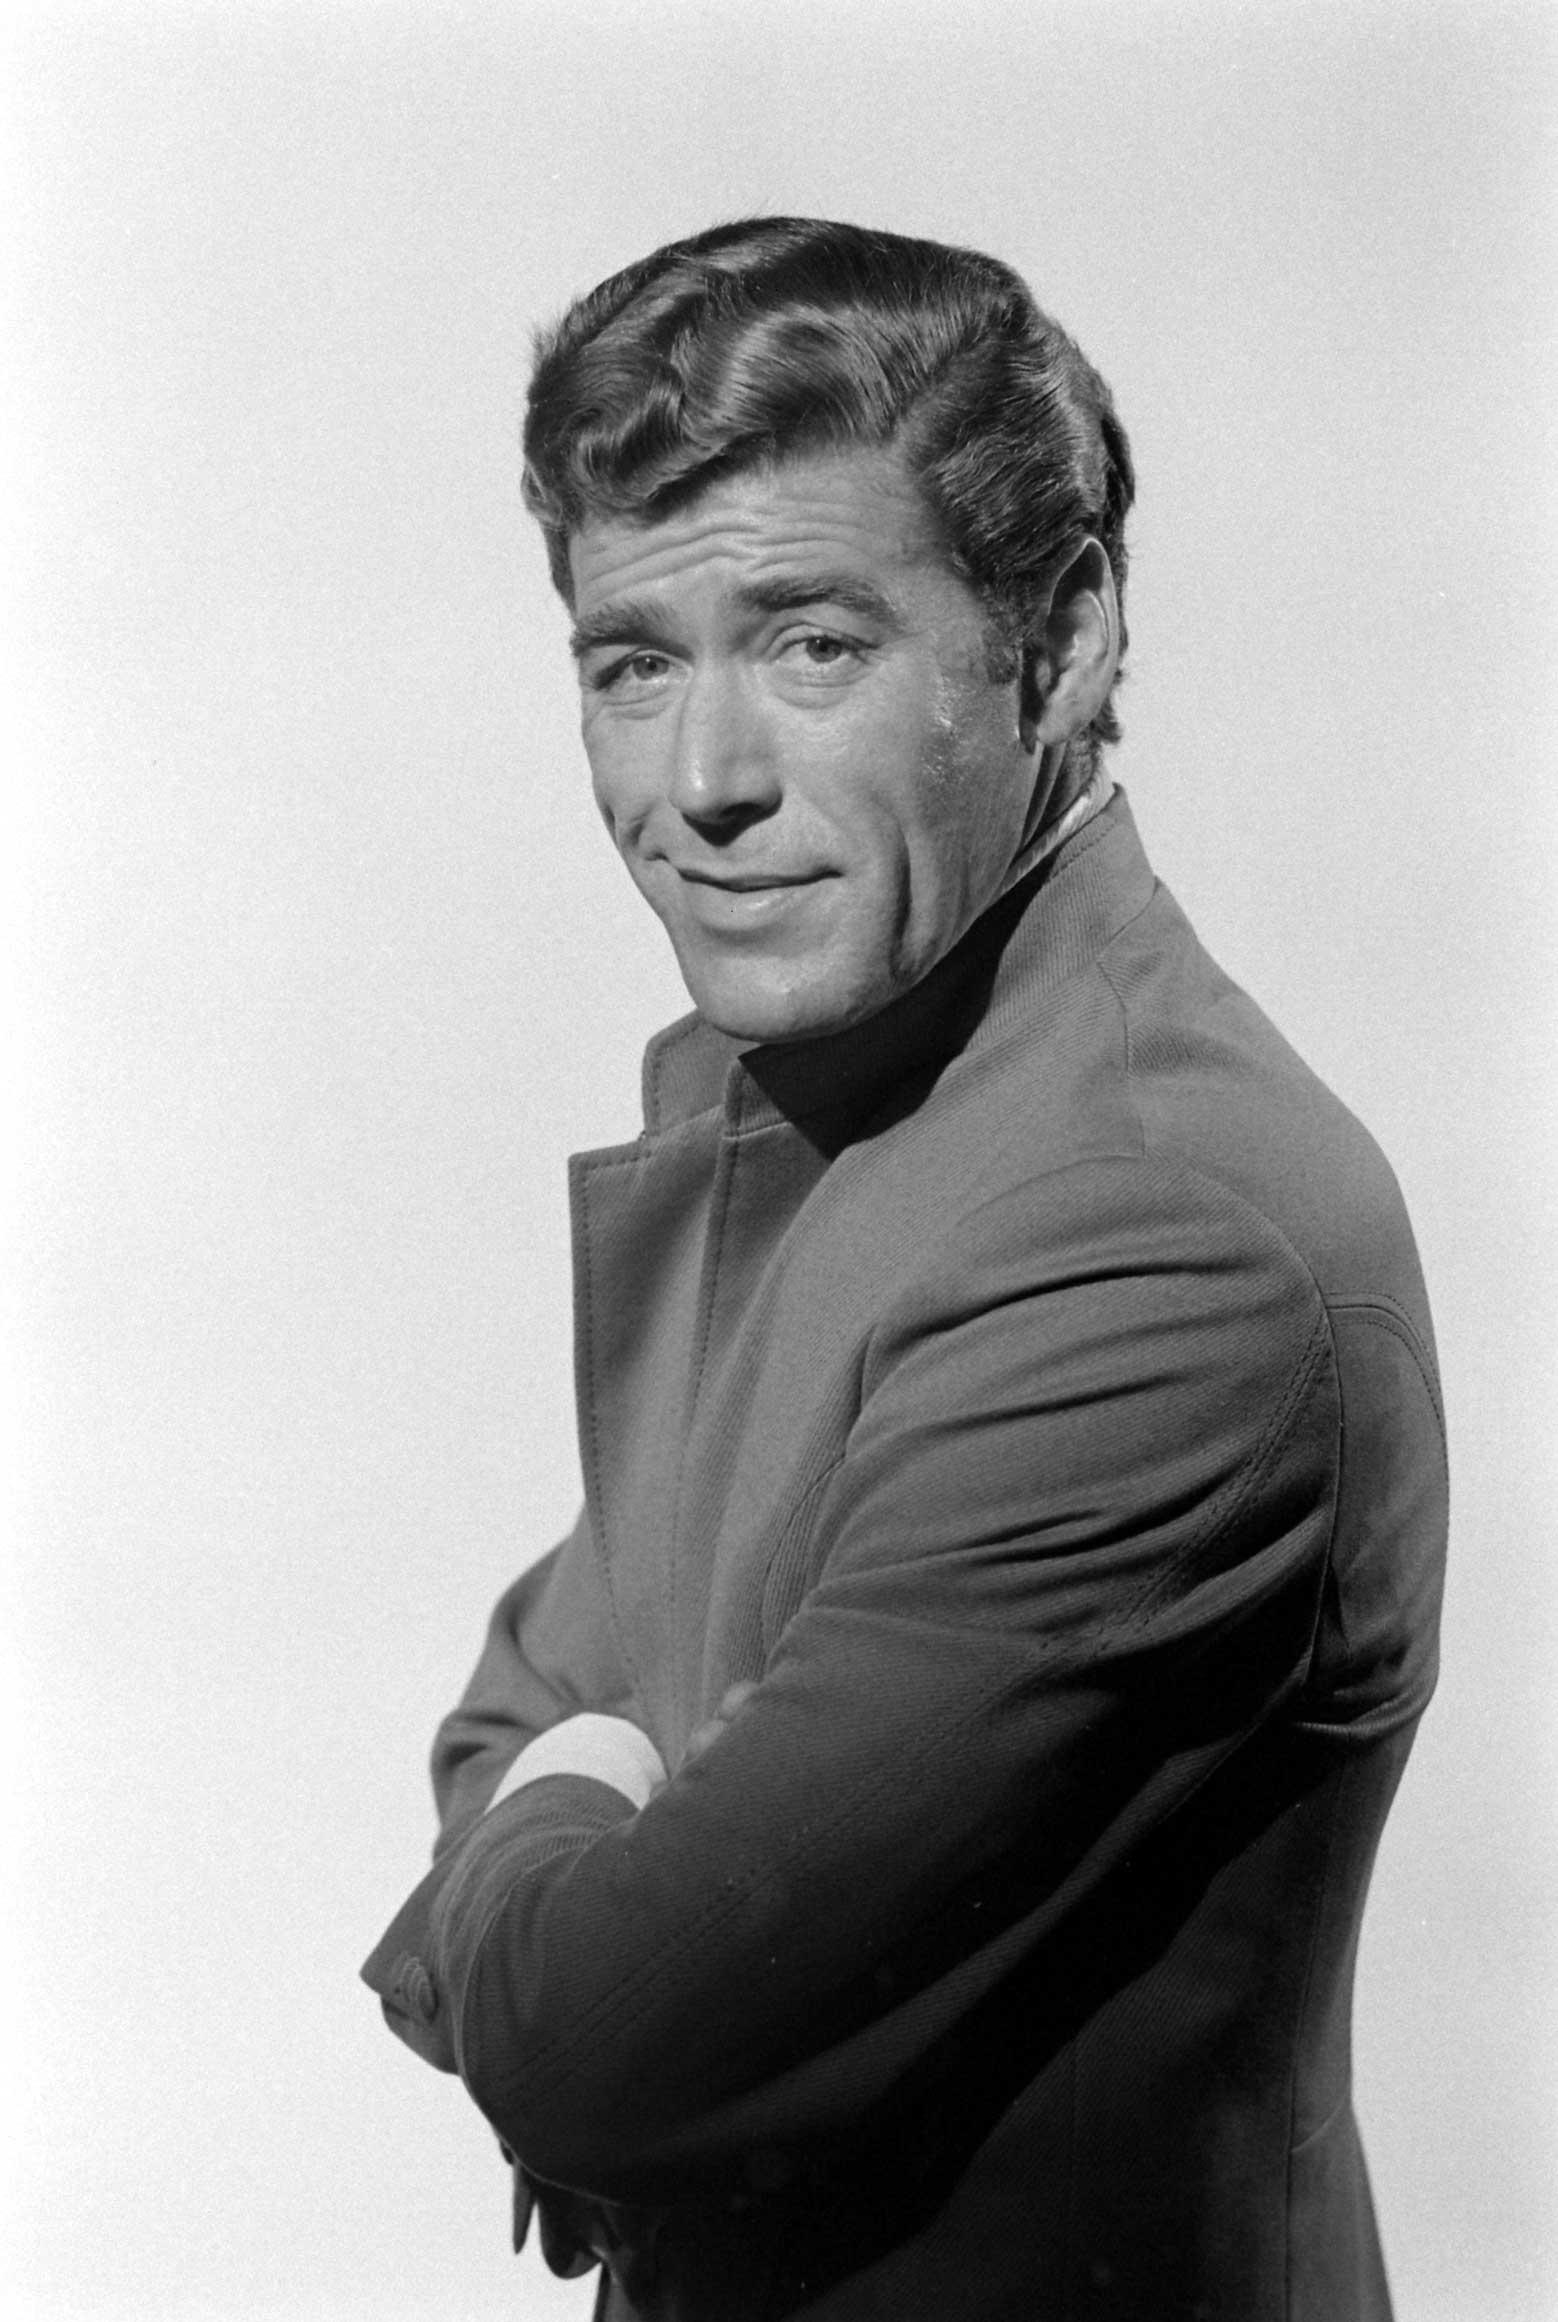 James Bond audition finalist Anthony Rogers, 1967.